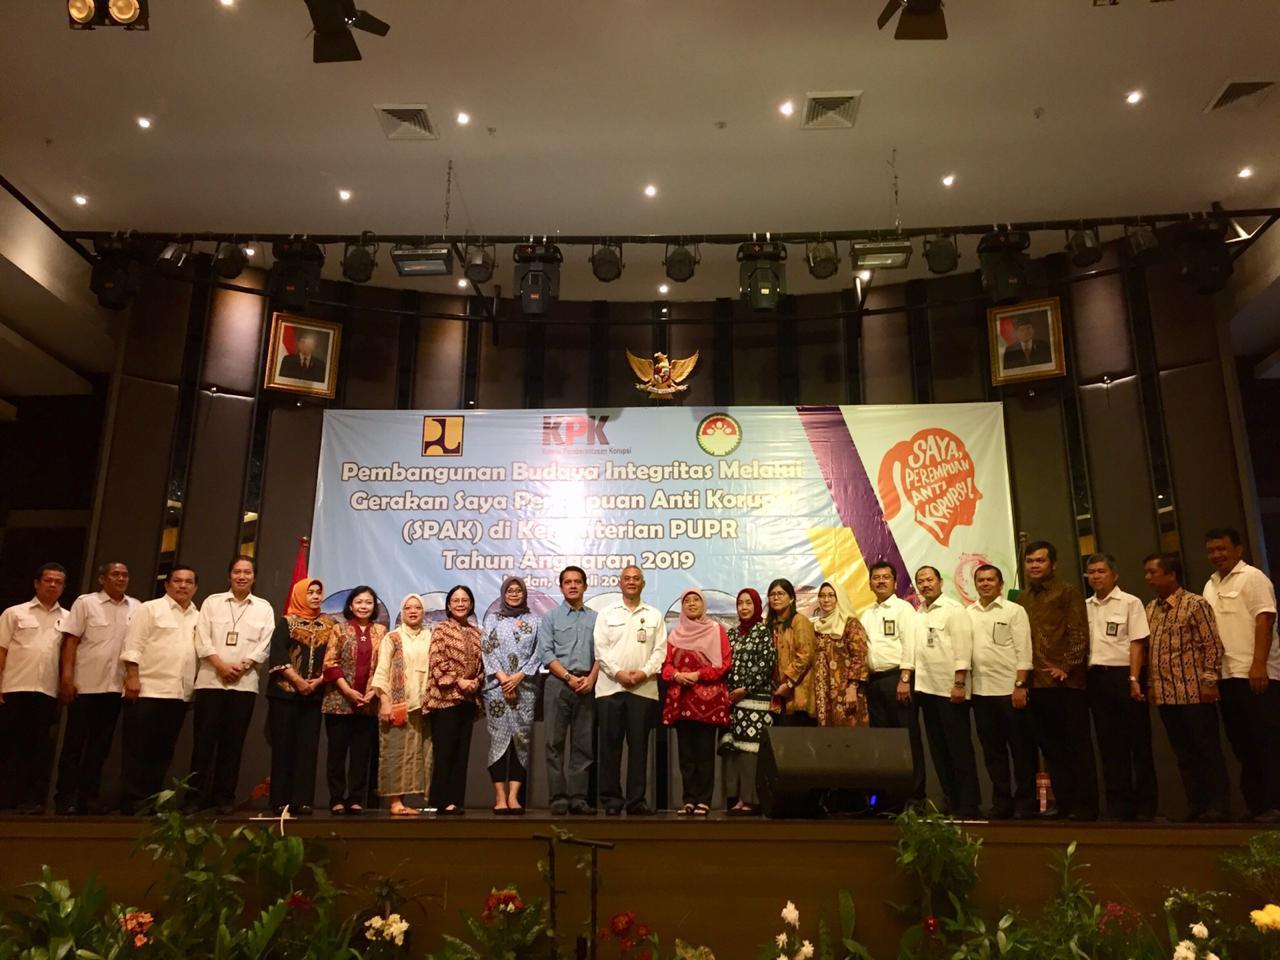 Foto PUPR Medan